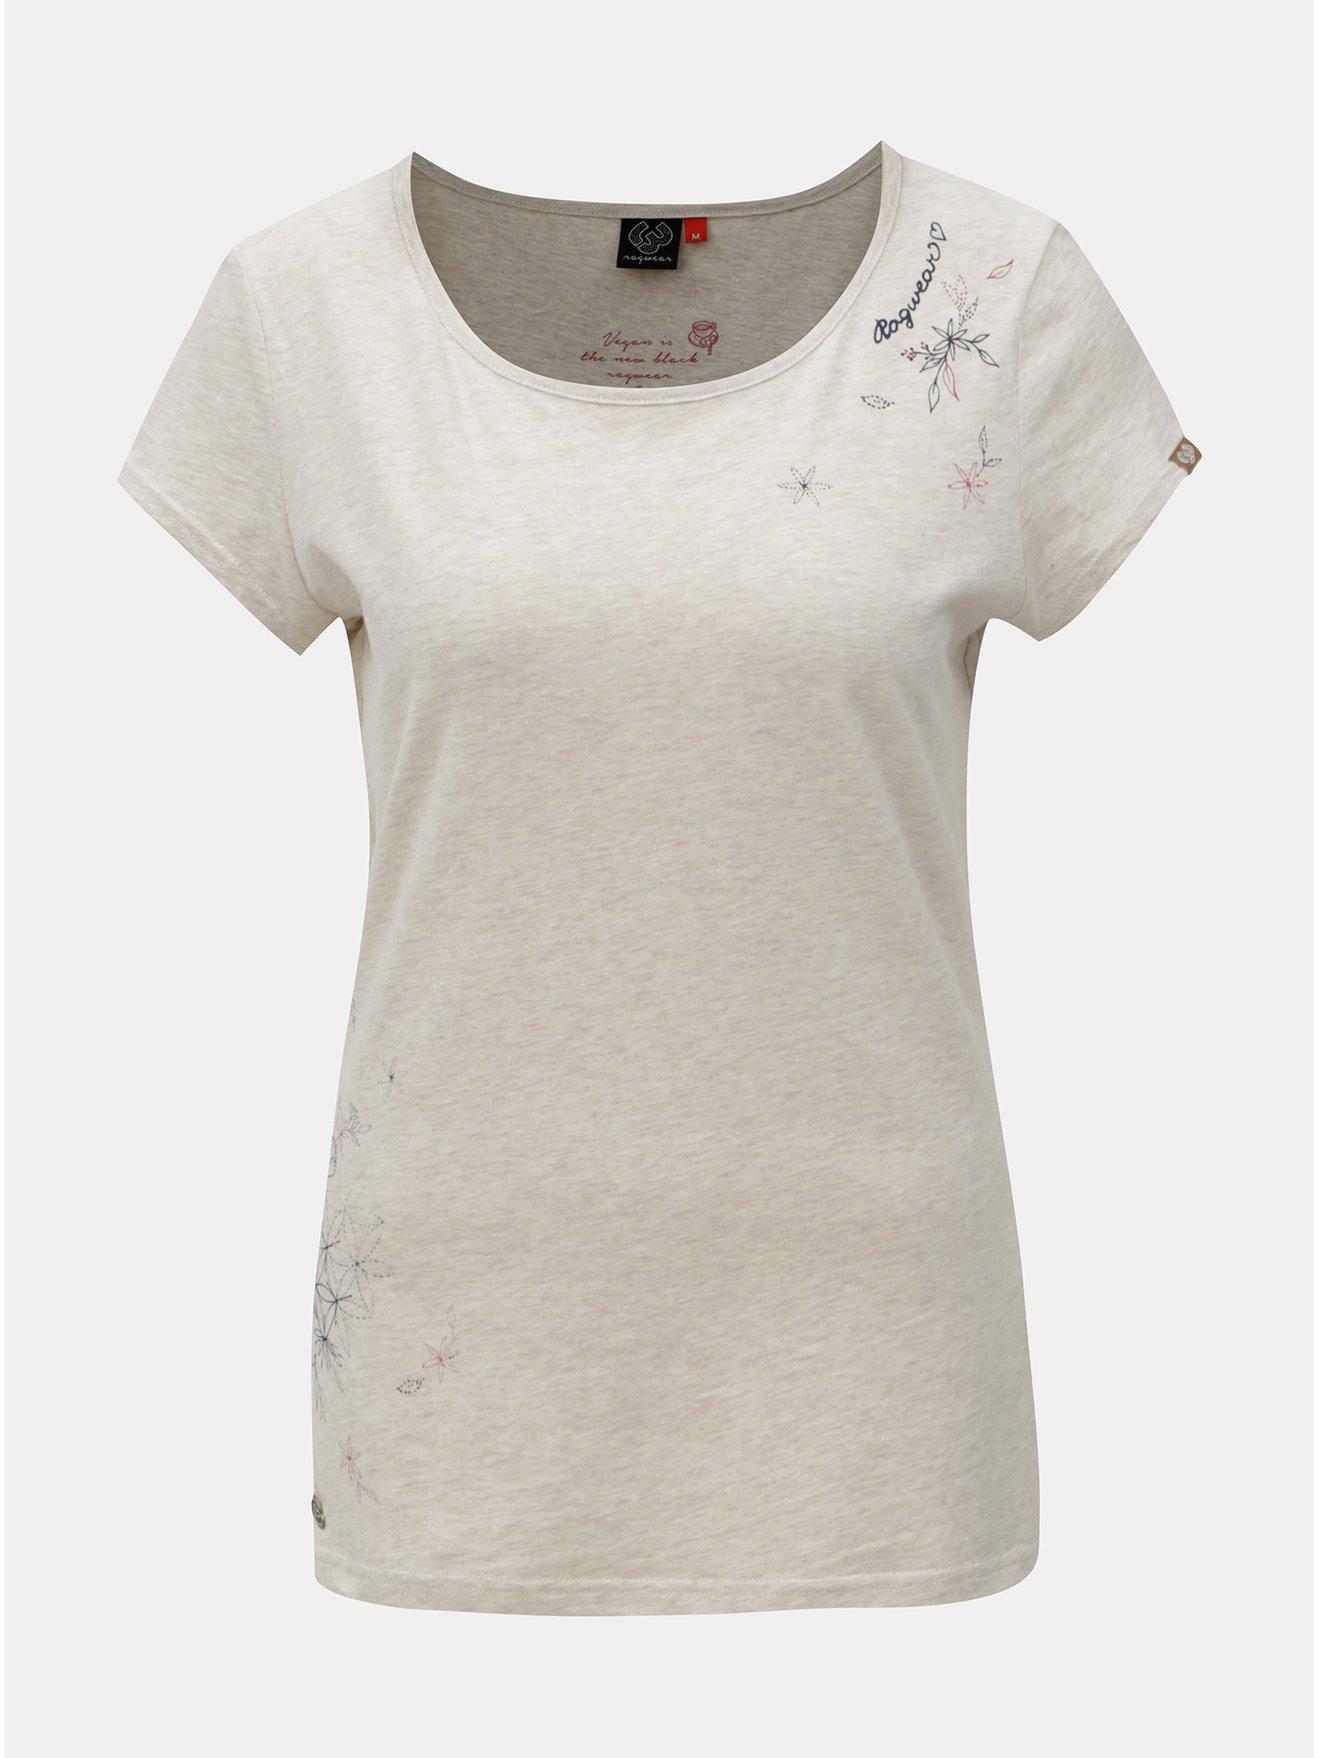 Šedé dámské žíhané tričko s potiskem Ragwear edb22cf891